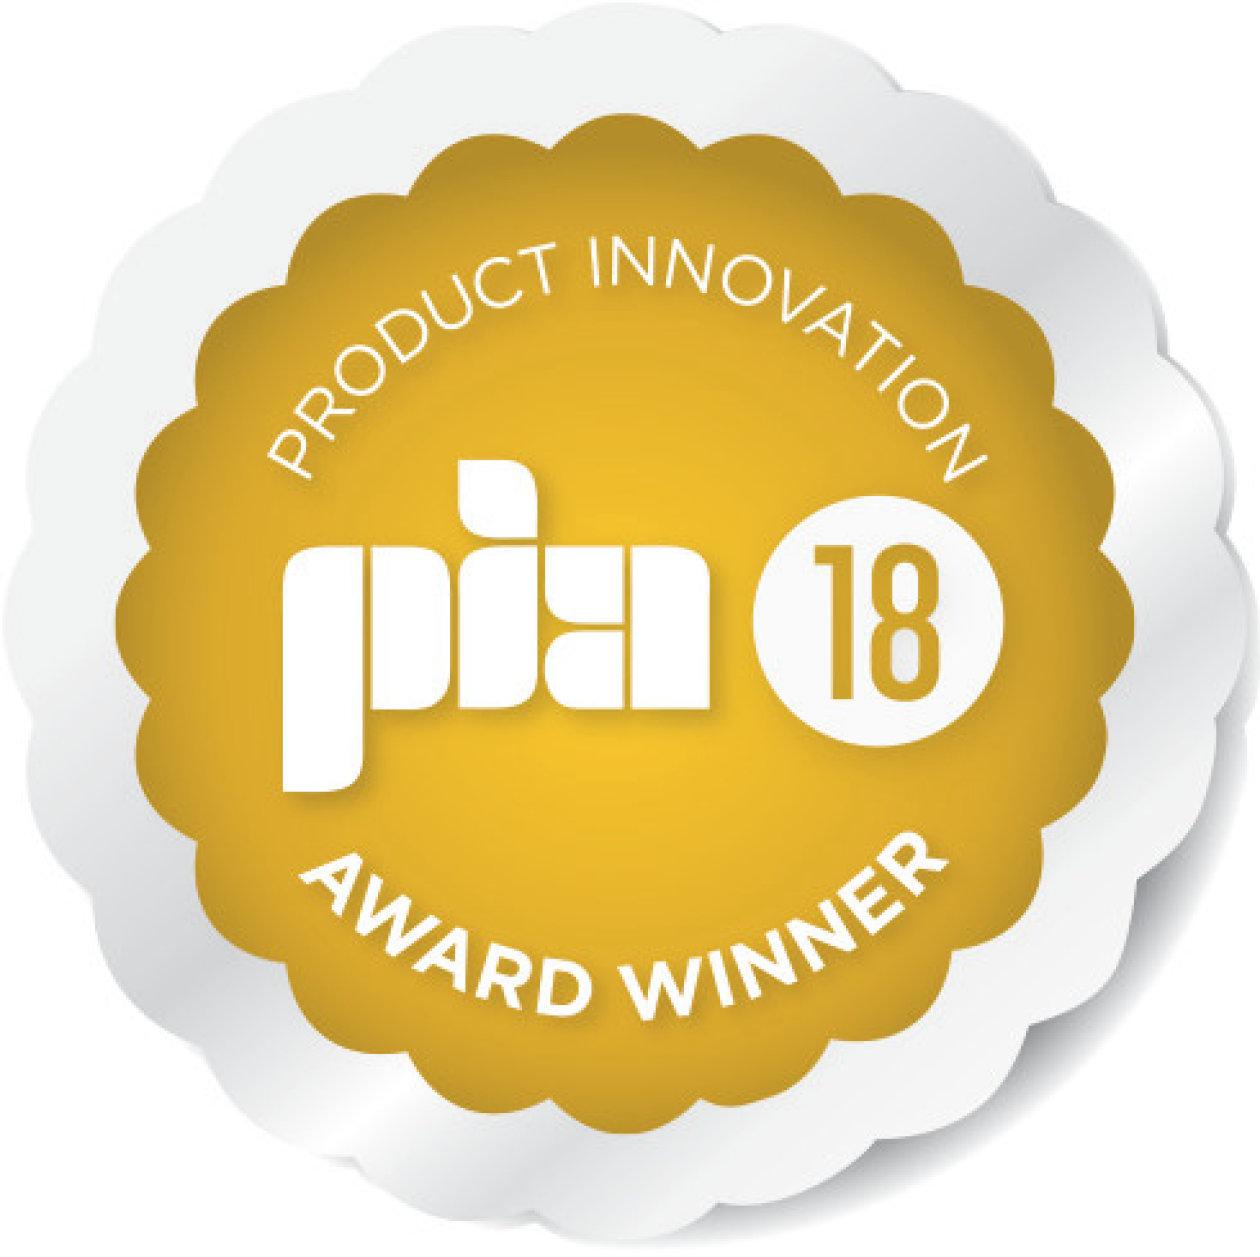 PIA 18 award winner